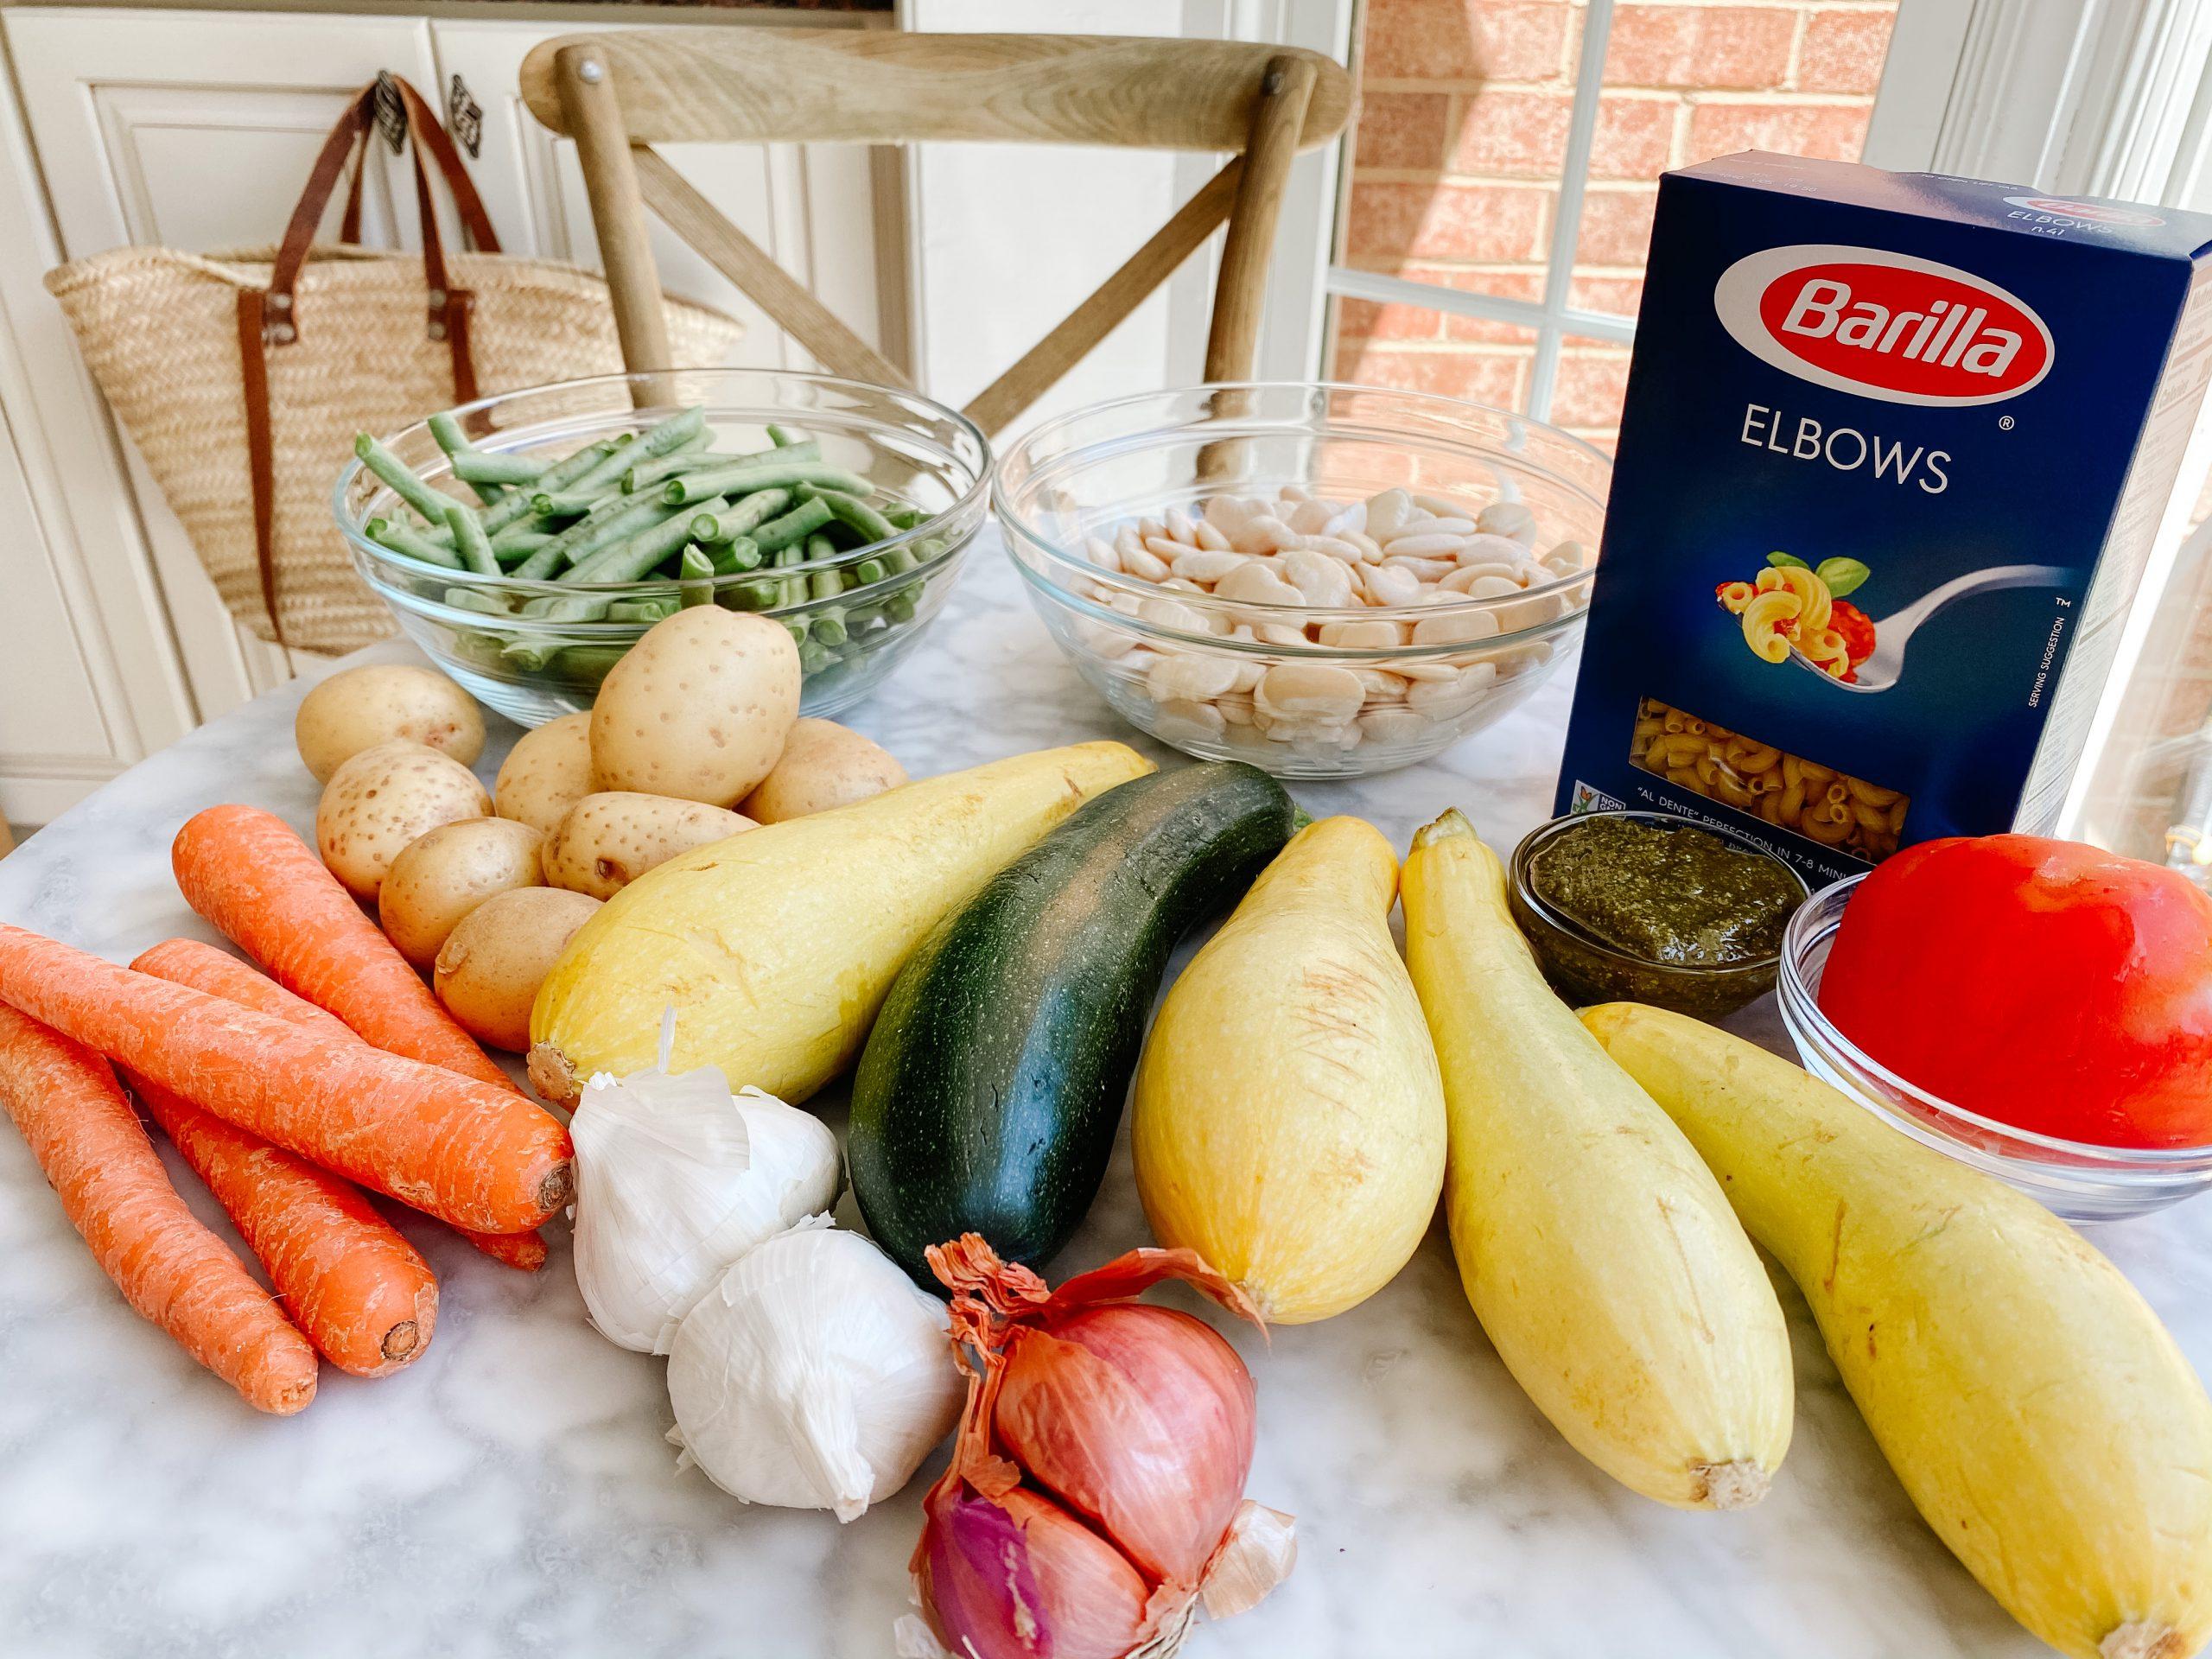 Soupe au Pistou Ingredients - squash, zucchini, carrots, potatoes, garlic, shallots, green beans, white beans, pasta